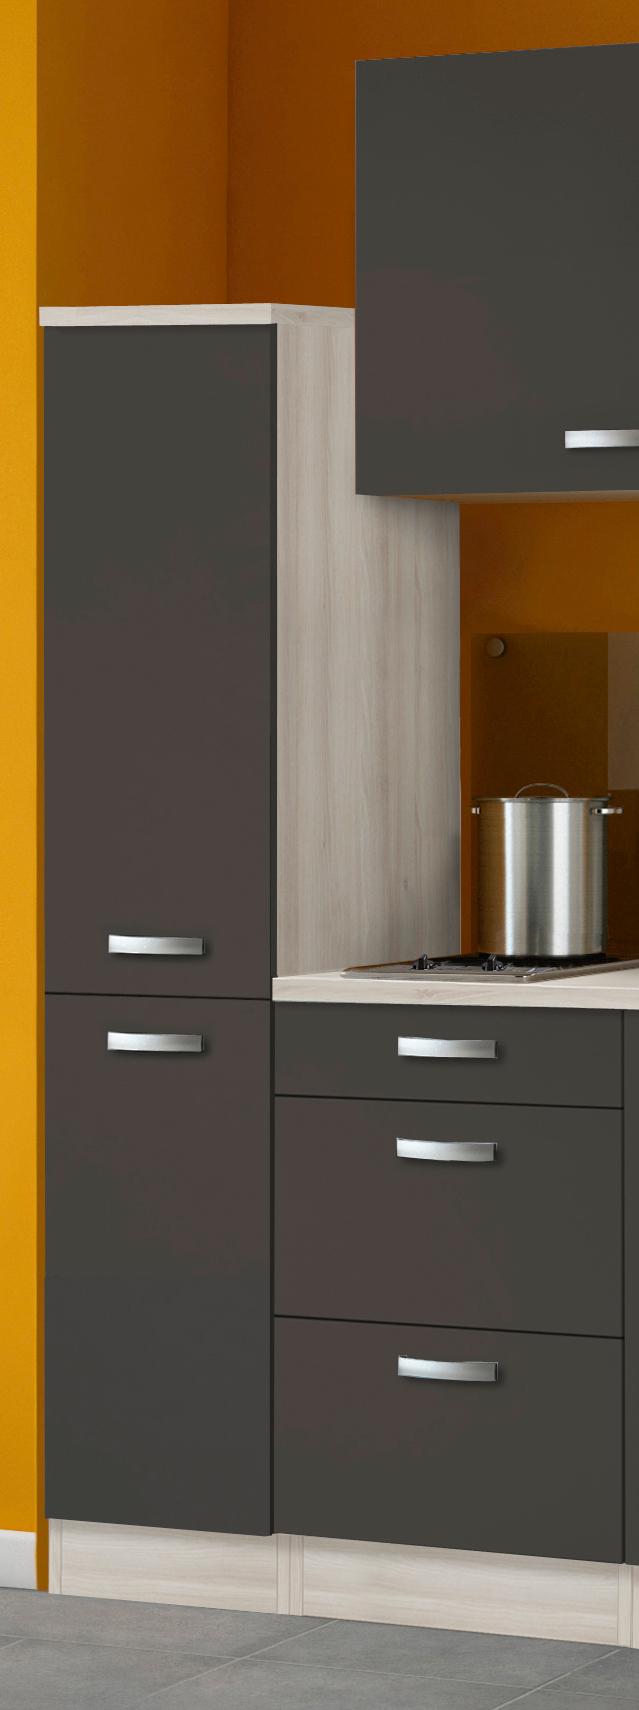 singlek che barcelona mit glaskeramik kochfeld breite 130 cm grau k che singlek chen. Black Bedroom Furniture Sets. Home Design Ideas